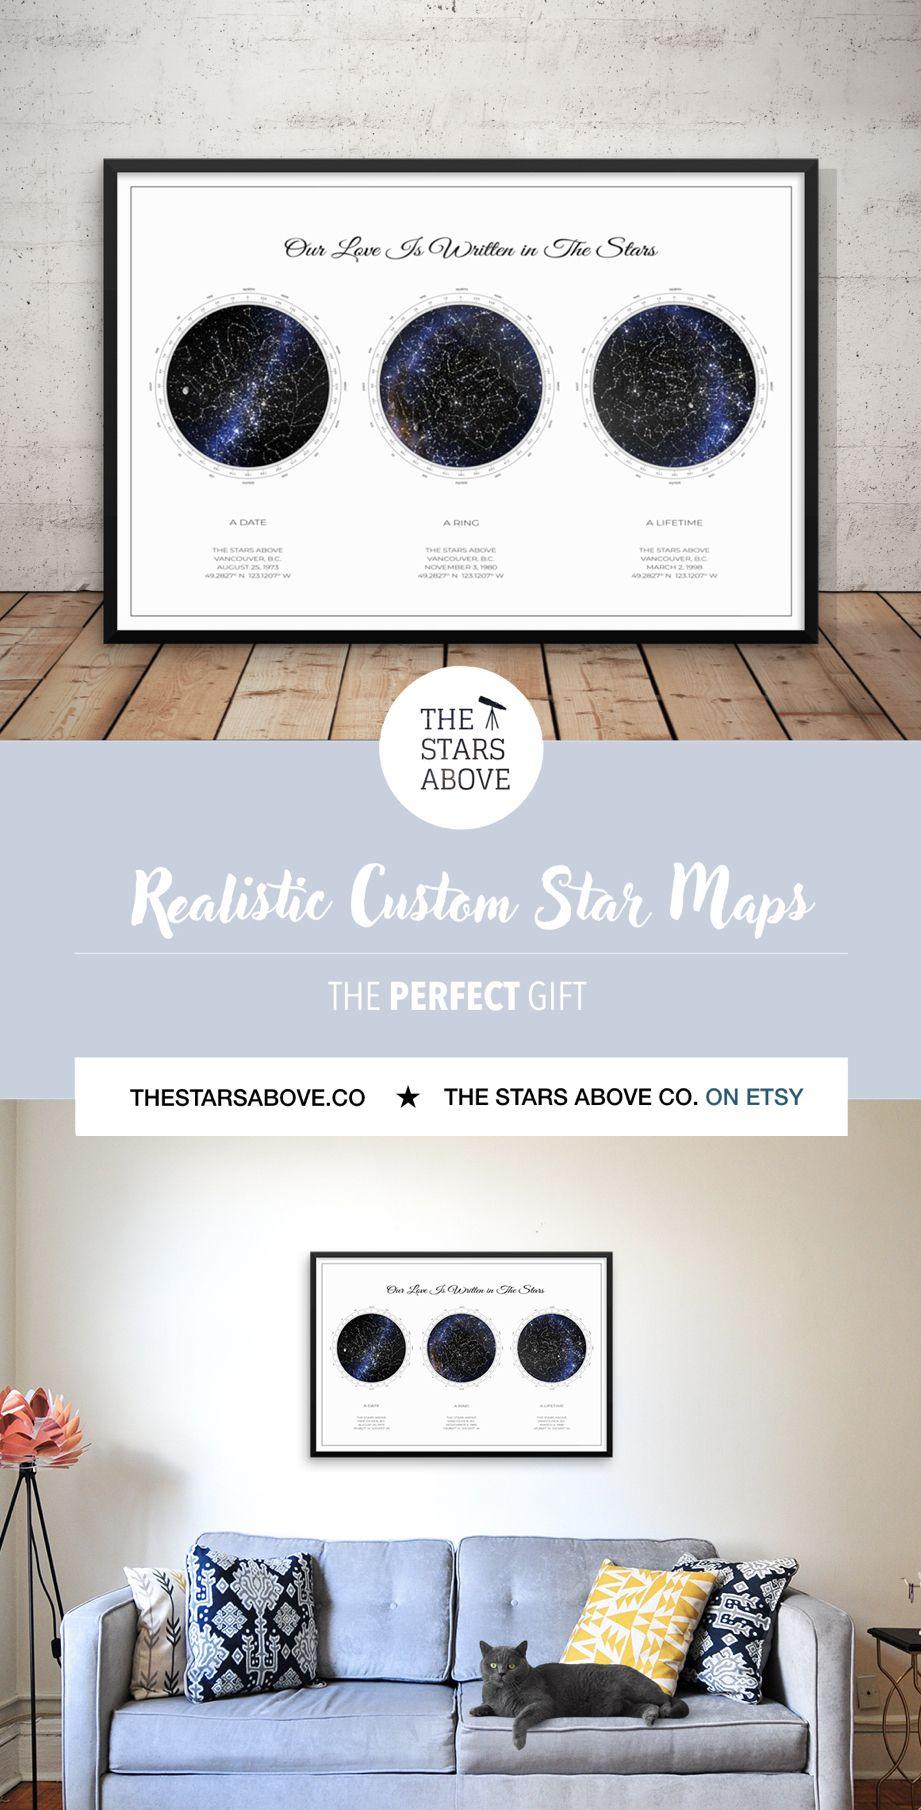 ee2419fcfa205 Custom Star Map 3 in 1, REALISTIC Night Sky Map, Custom Star Poster ...